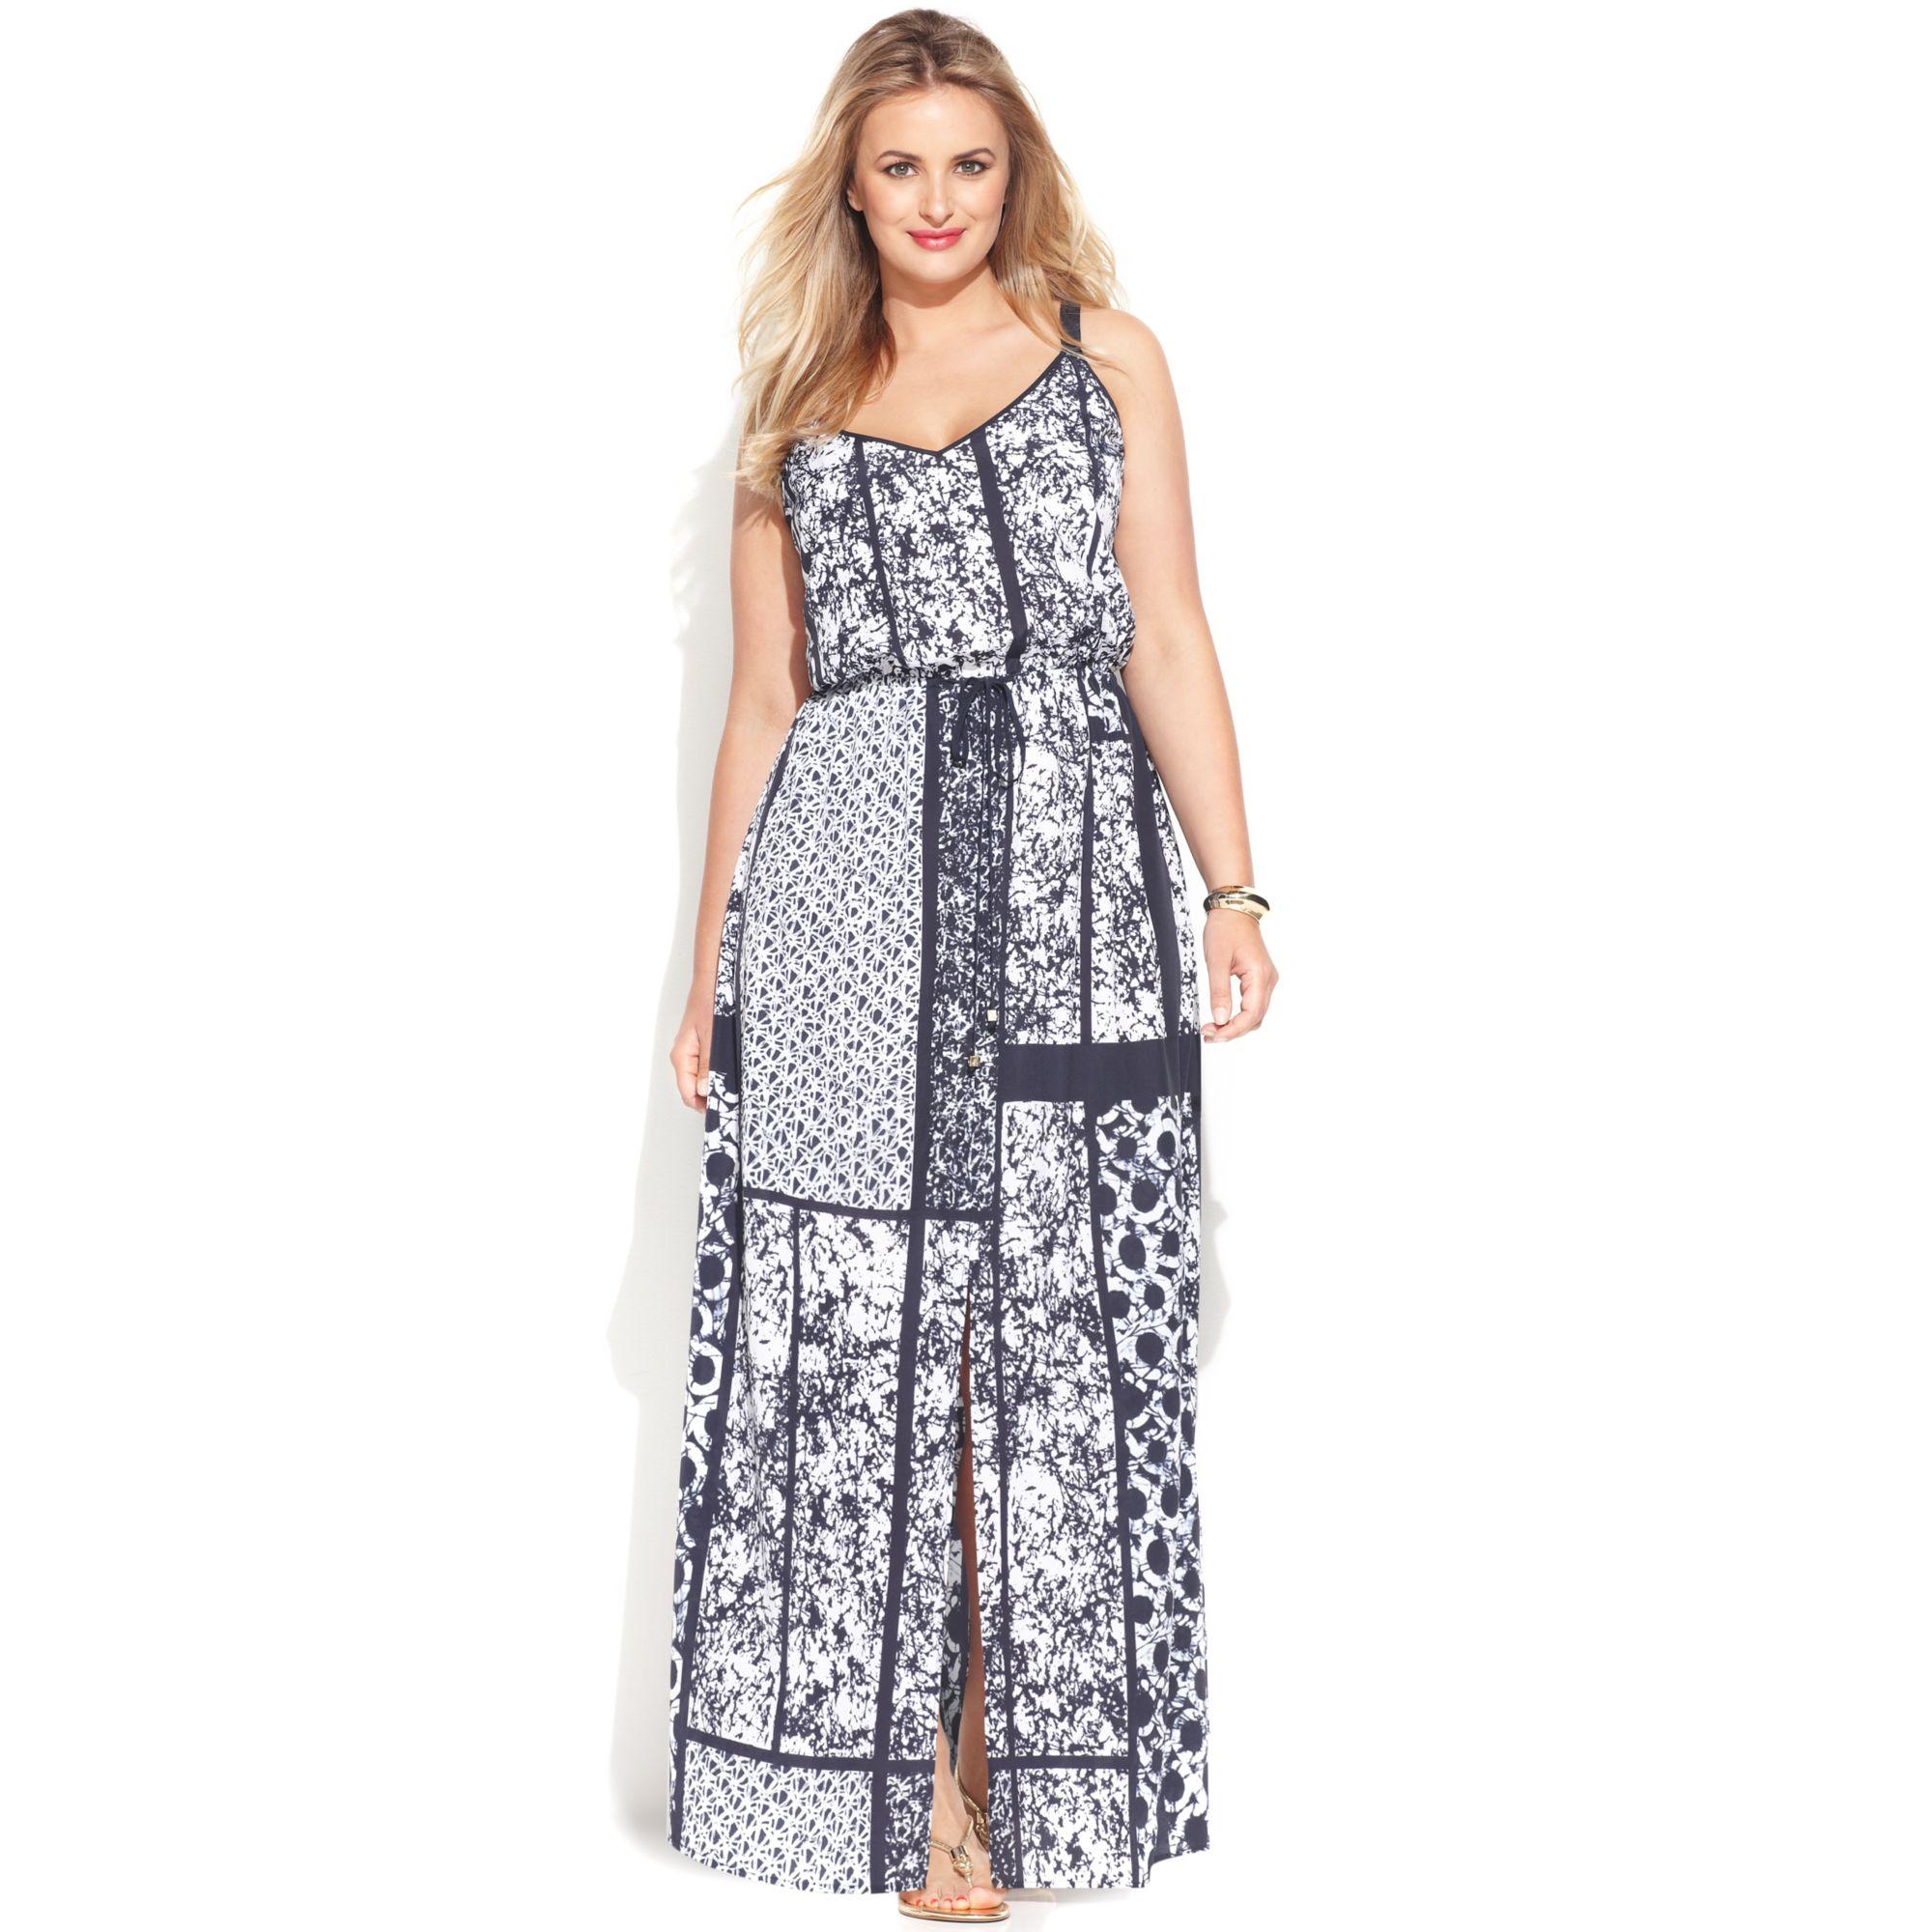 e7138fdb96f Lyst - Michael Kors Michael Plus Size Printed Drawstring Maxi Dress ...